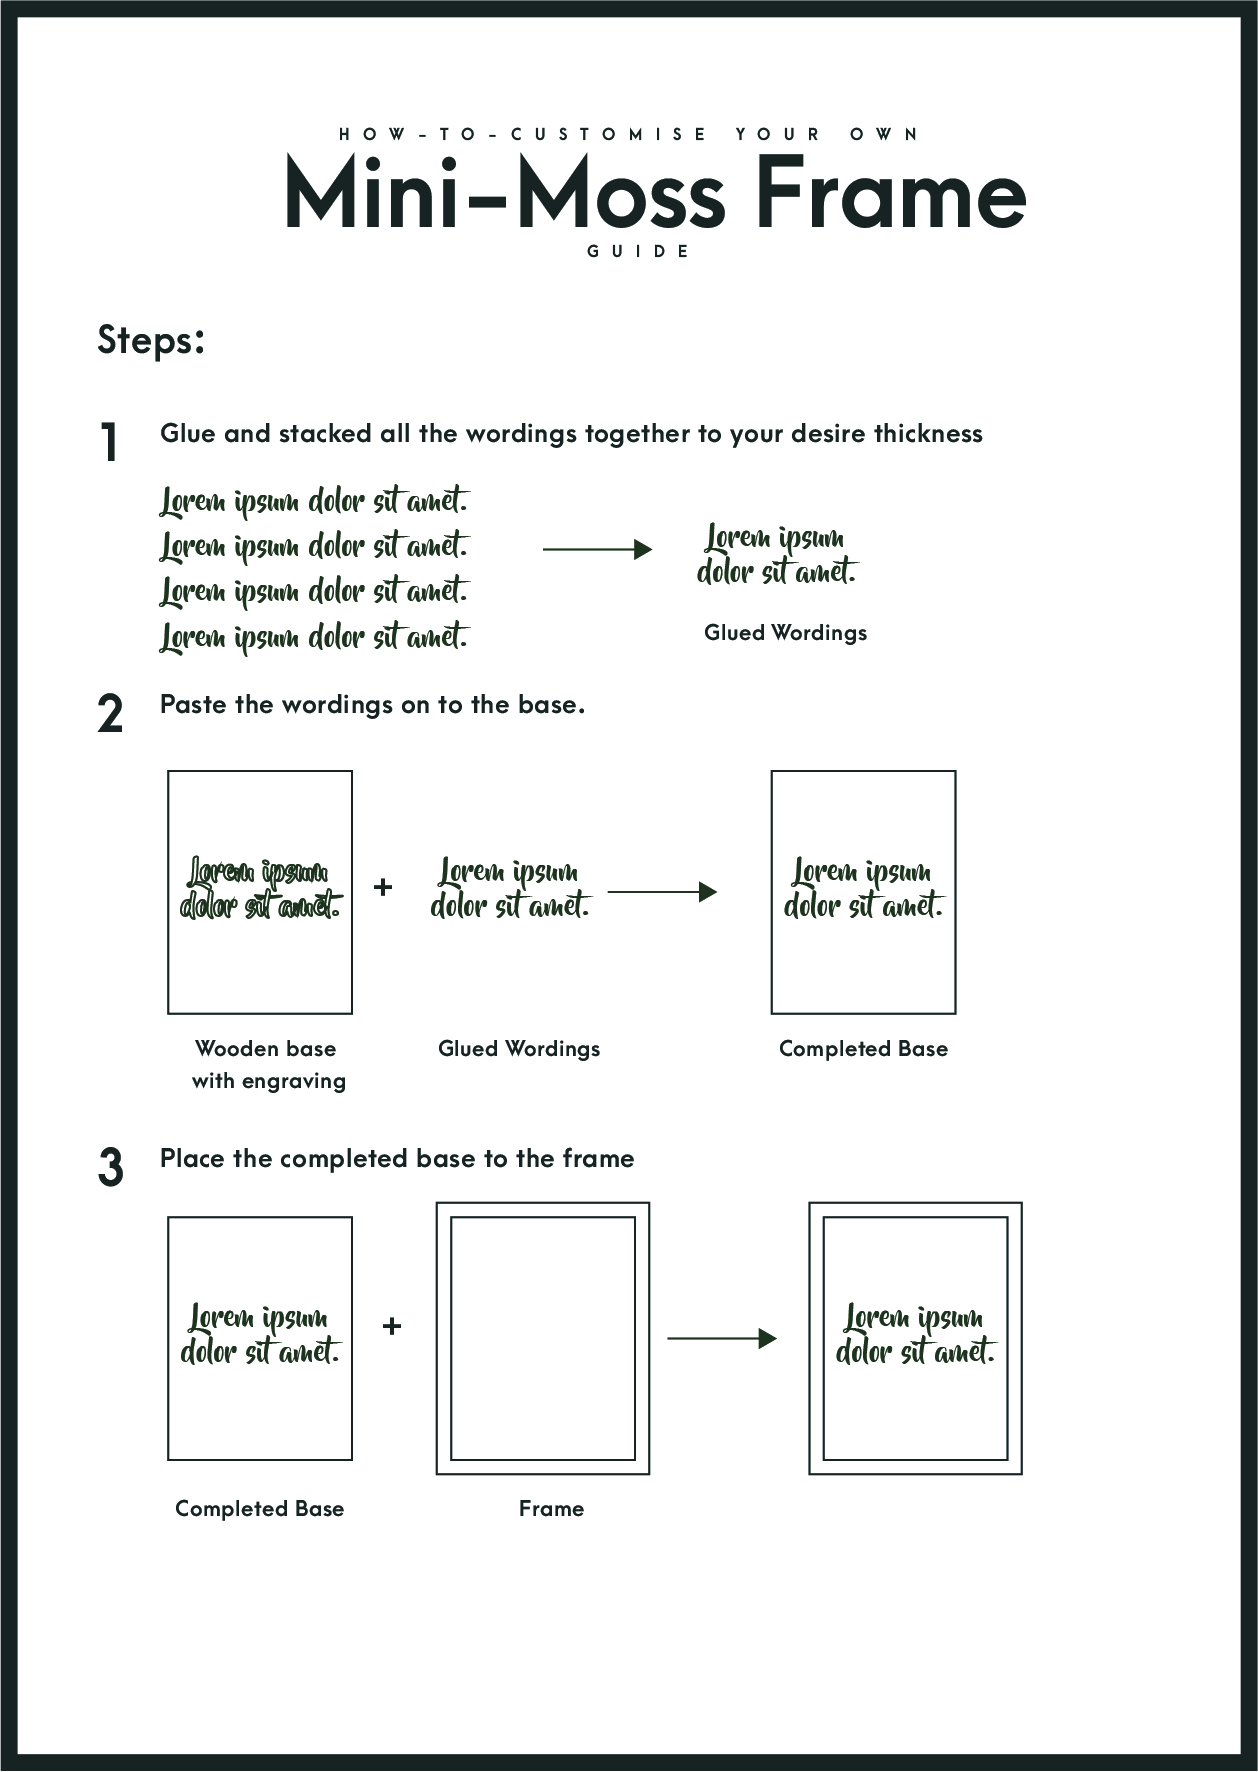 How to make 1.jpg